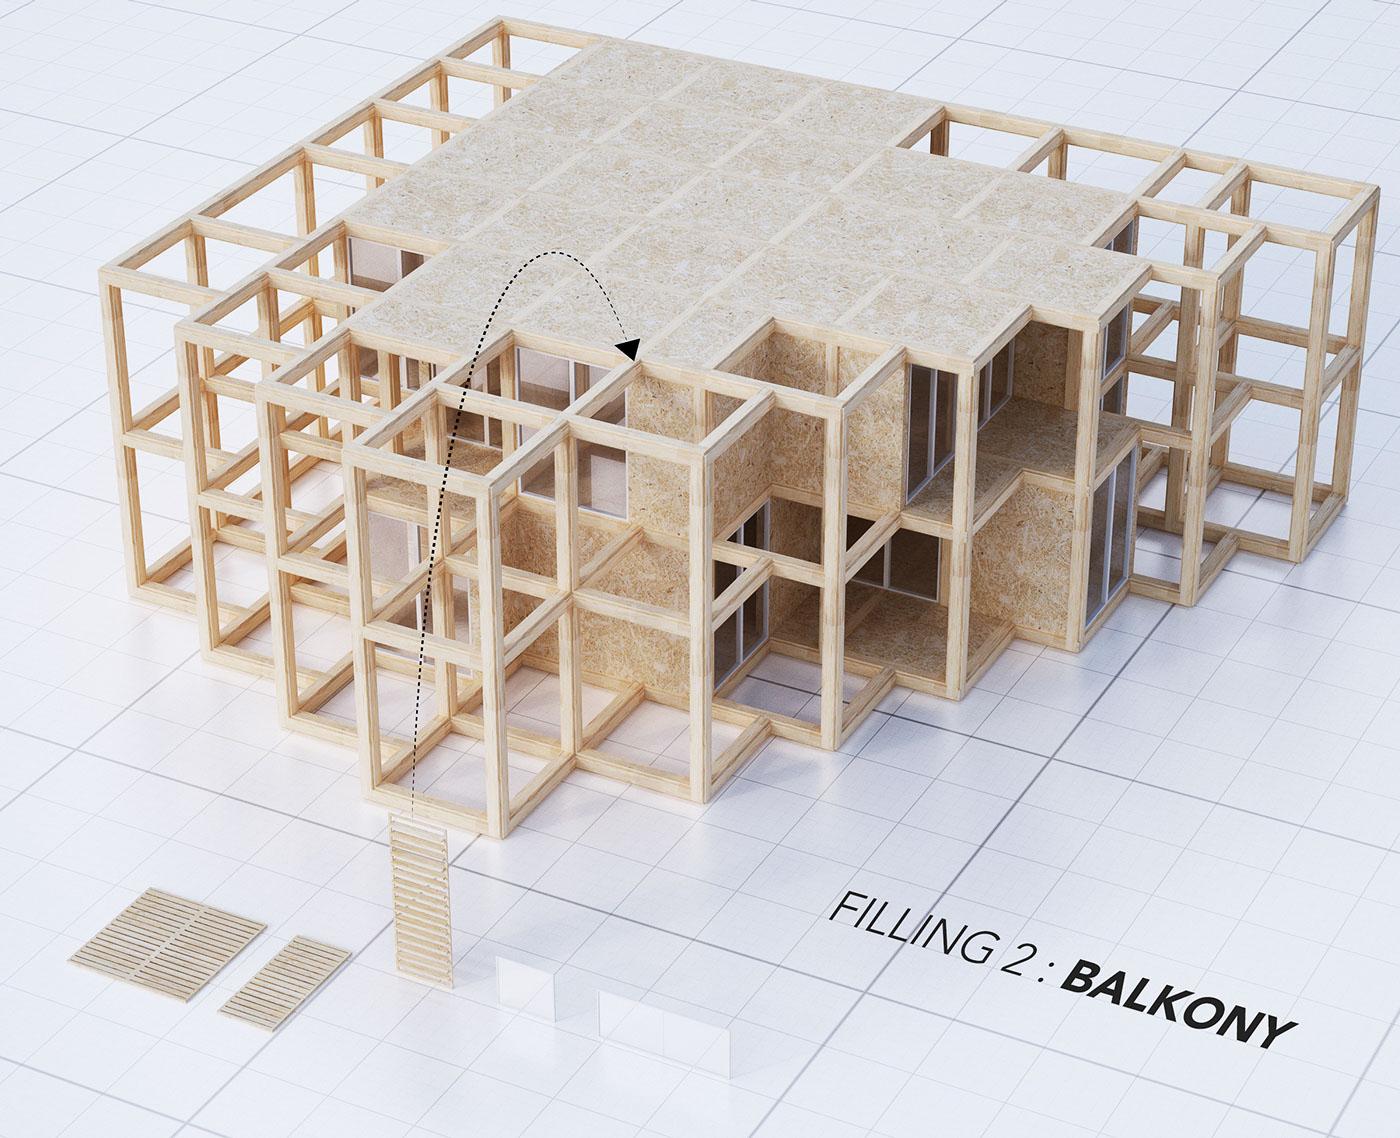 A modular system of a structural framework - balcony